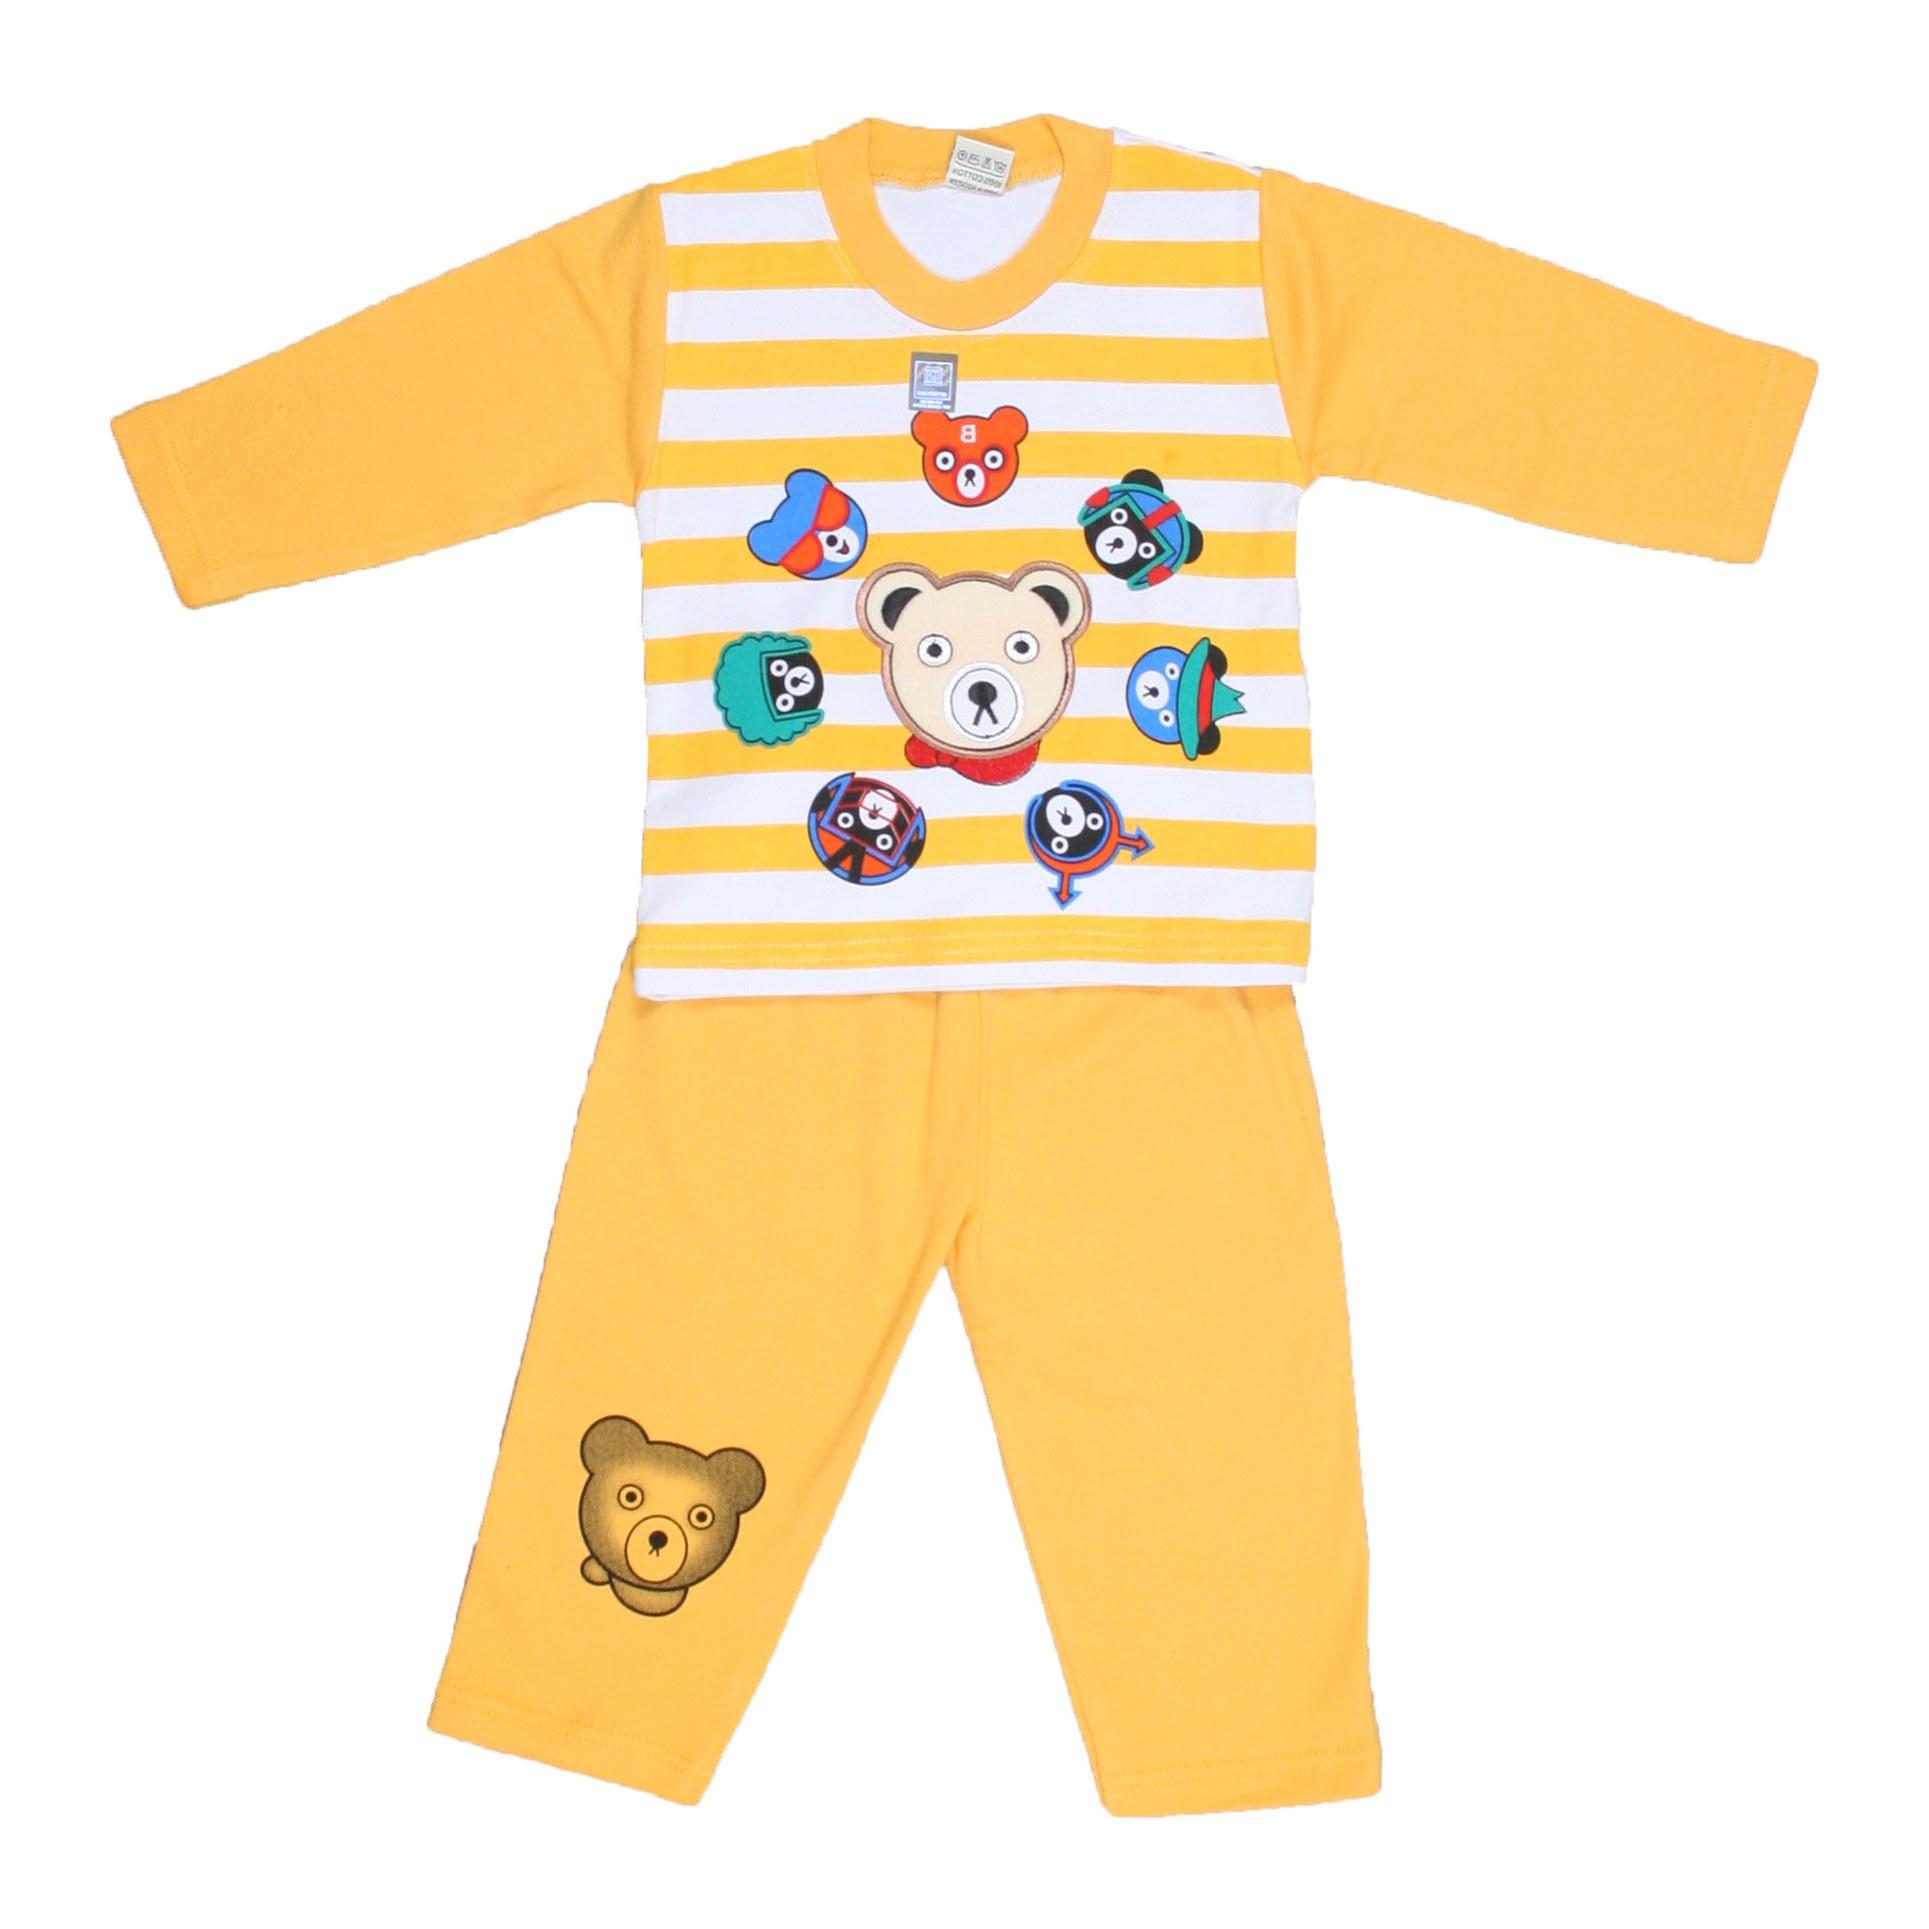 Design Baju Lebaran 2018 Anak Laki Laki Jxdu Pakaian Tidur